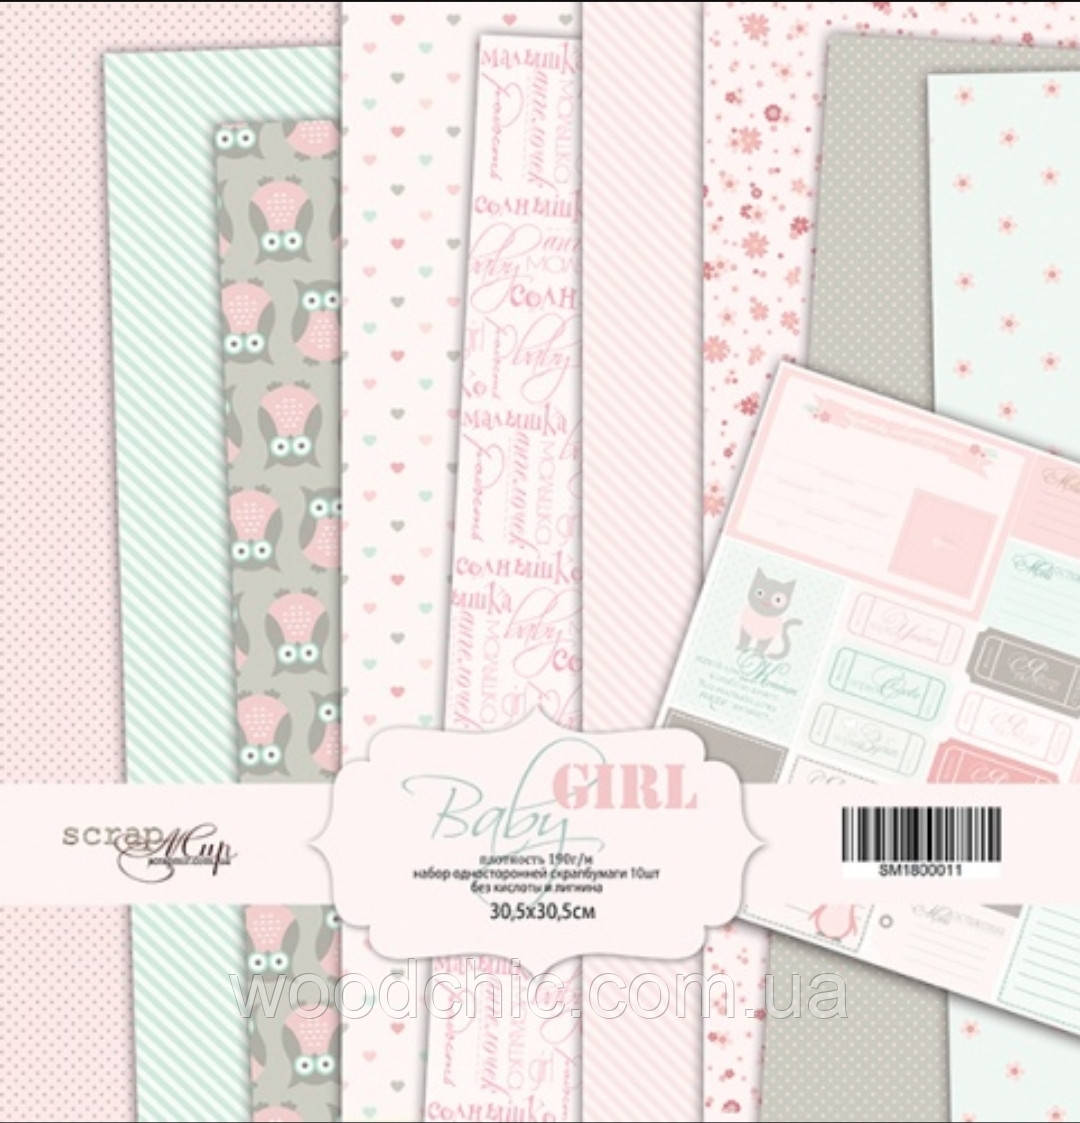 Набор односторонней бумаги 30х30см от Scrapmir Baby Girl 10шт